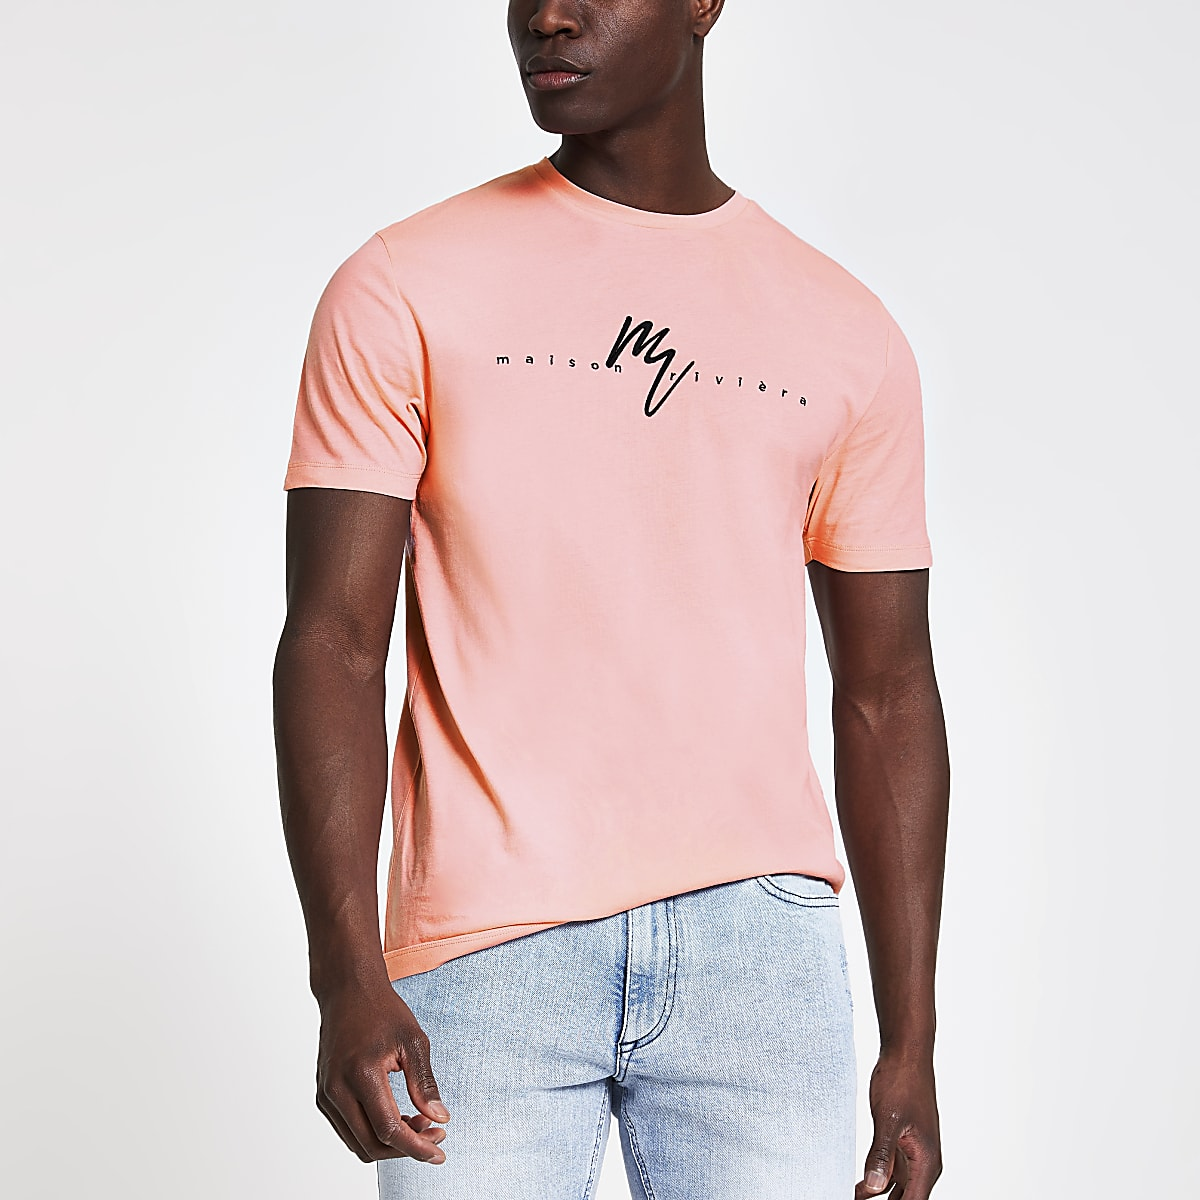 Coral 'Maison Riviera' slim fit T-shirt